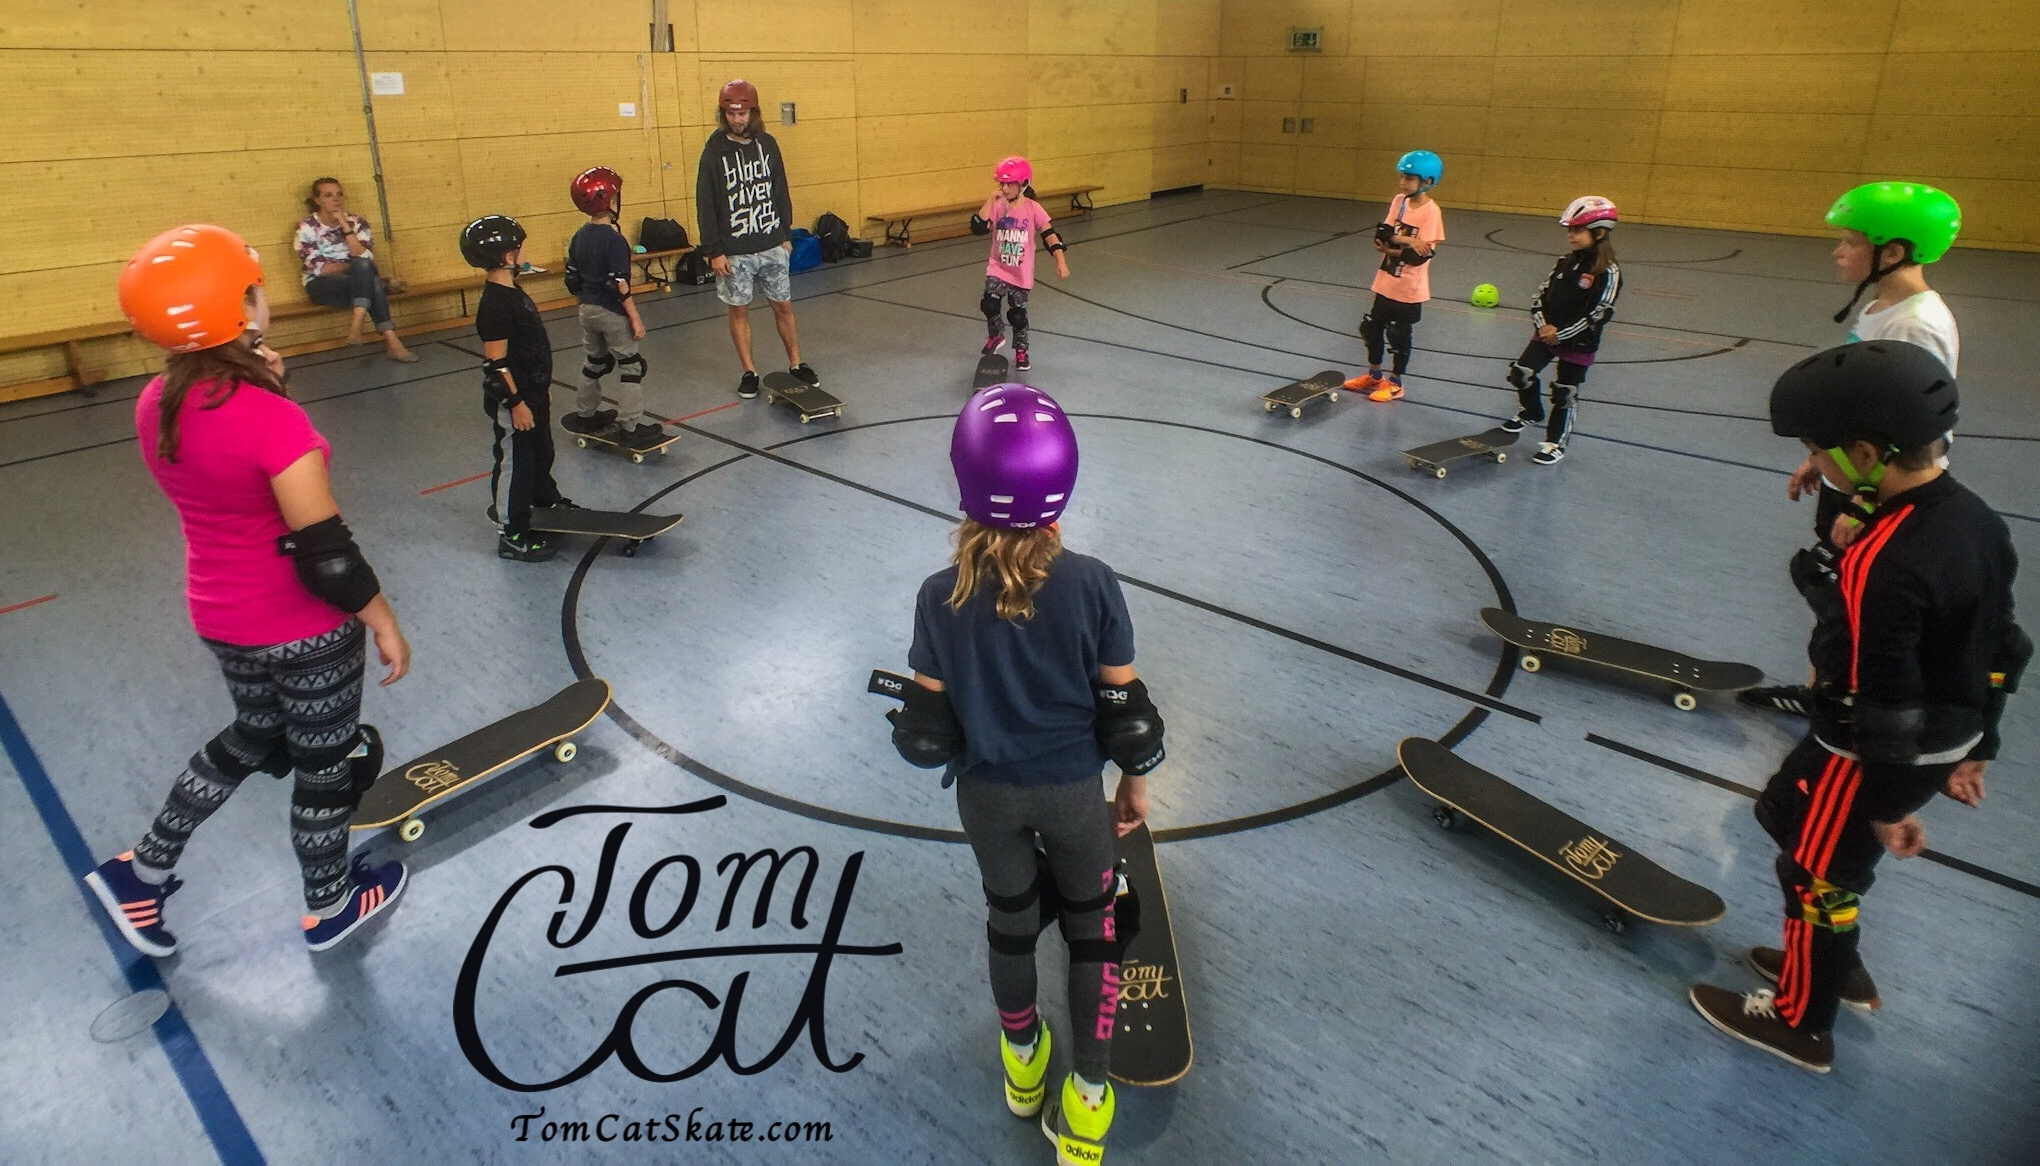 Skatkurs Erpfting Landsberg am Lech Tom Cat Skate Kurse  2.JPG